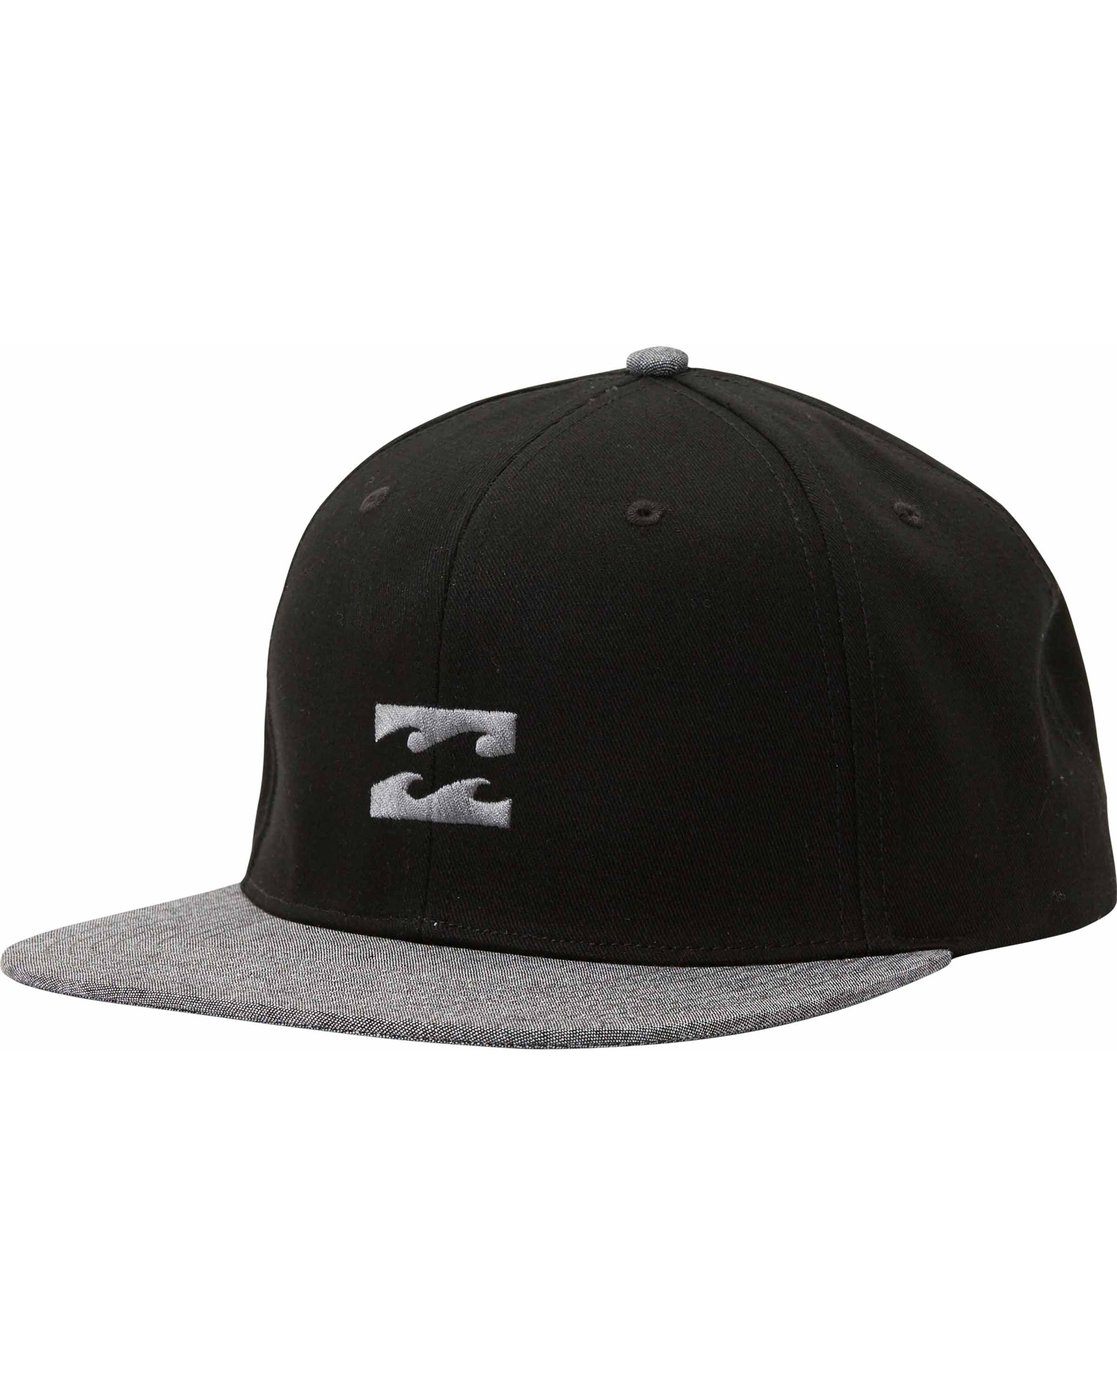 0 All Day Snapback Hat Black MAHTLADS Billabong |